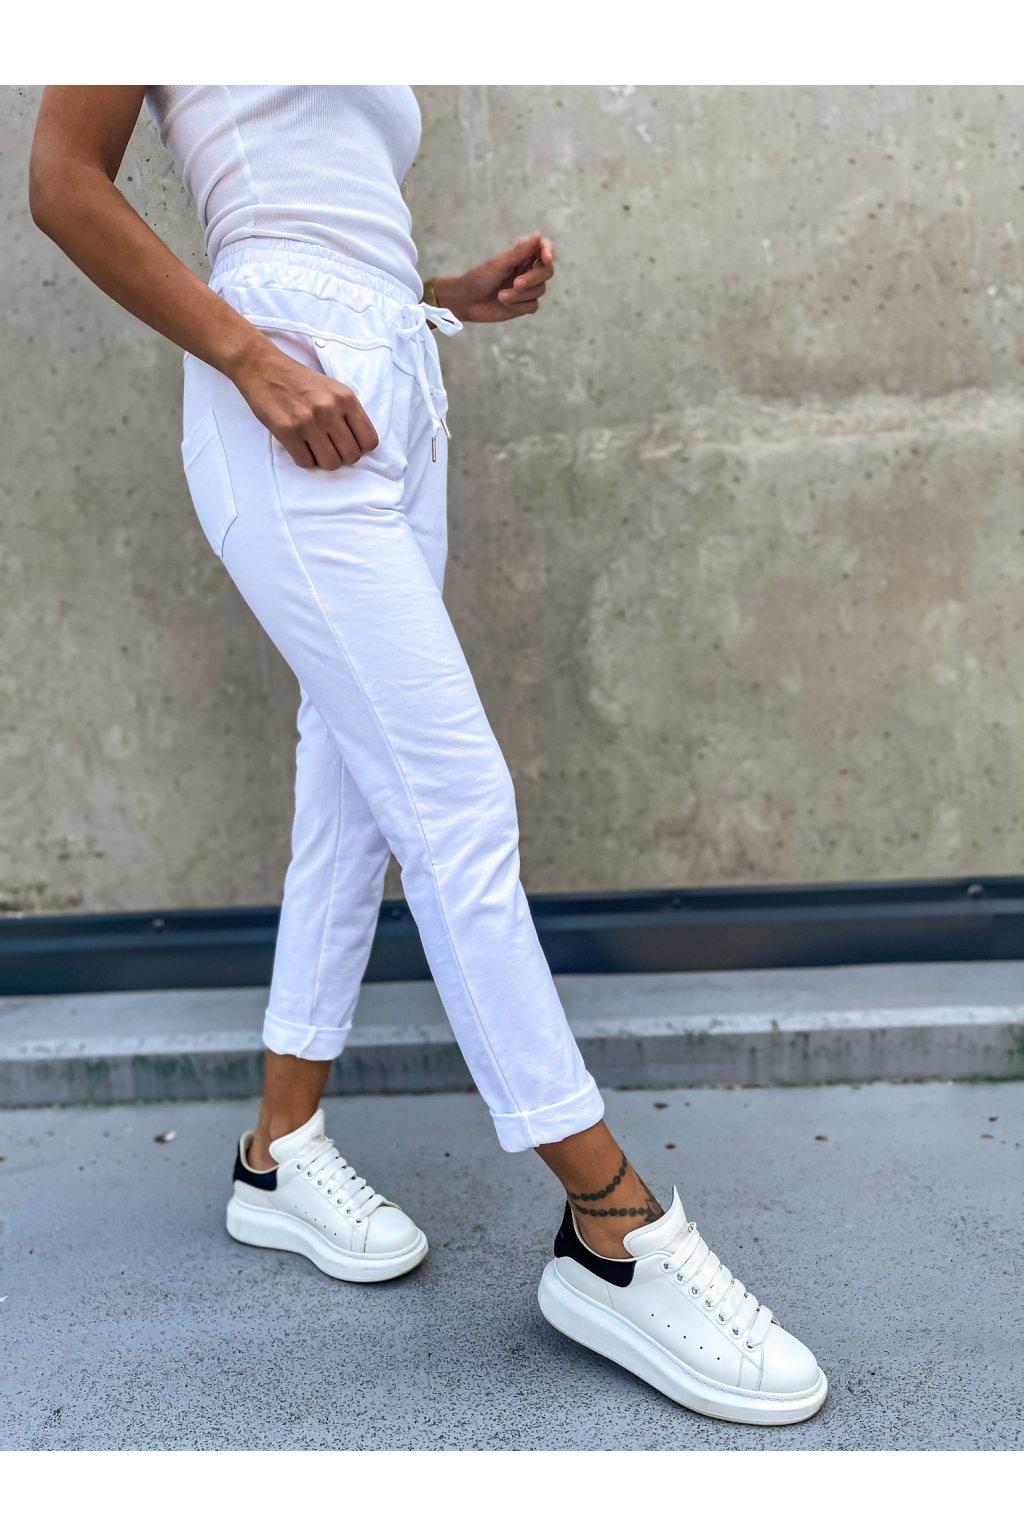 damske teplakove kalhoty pascall white eshopat cz 4